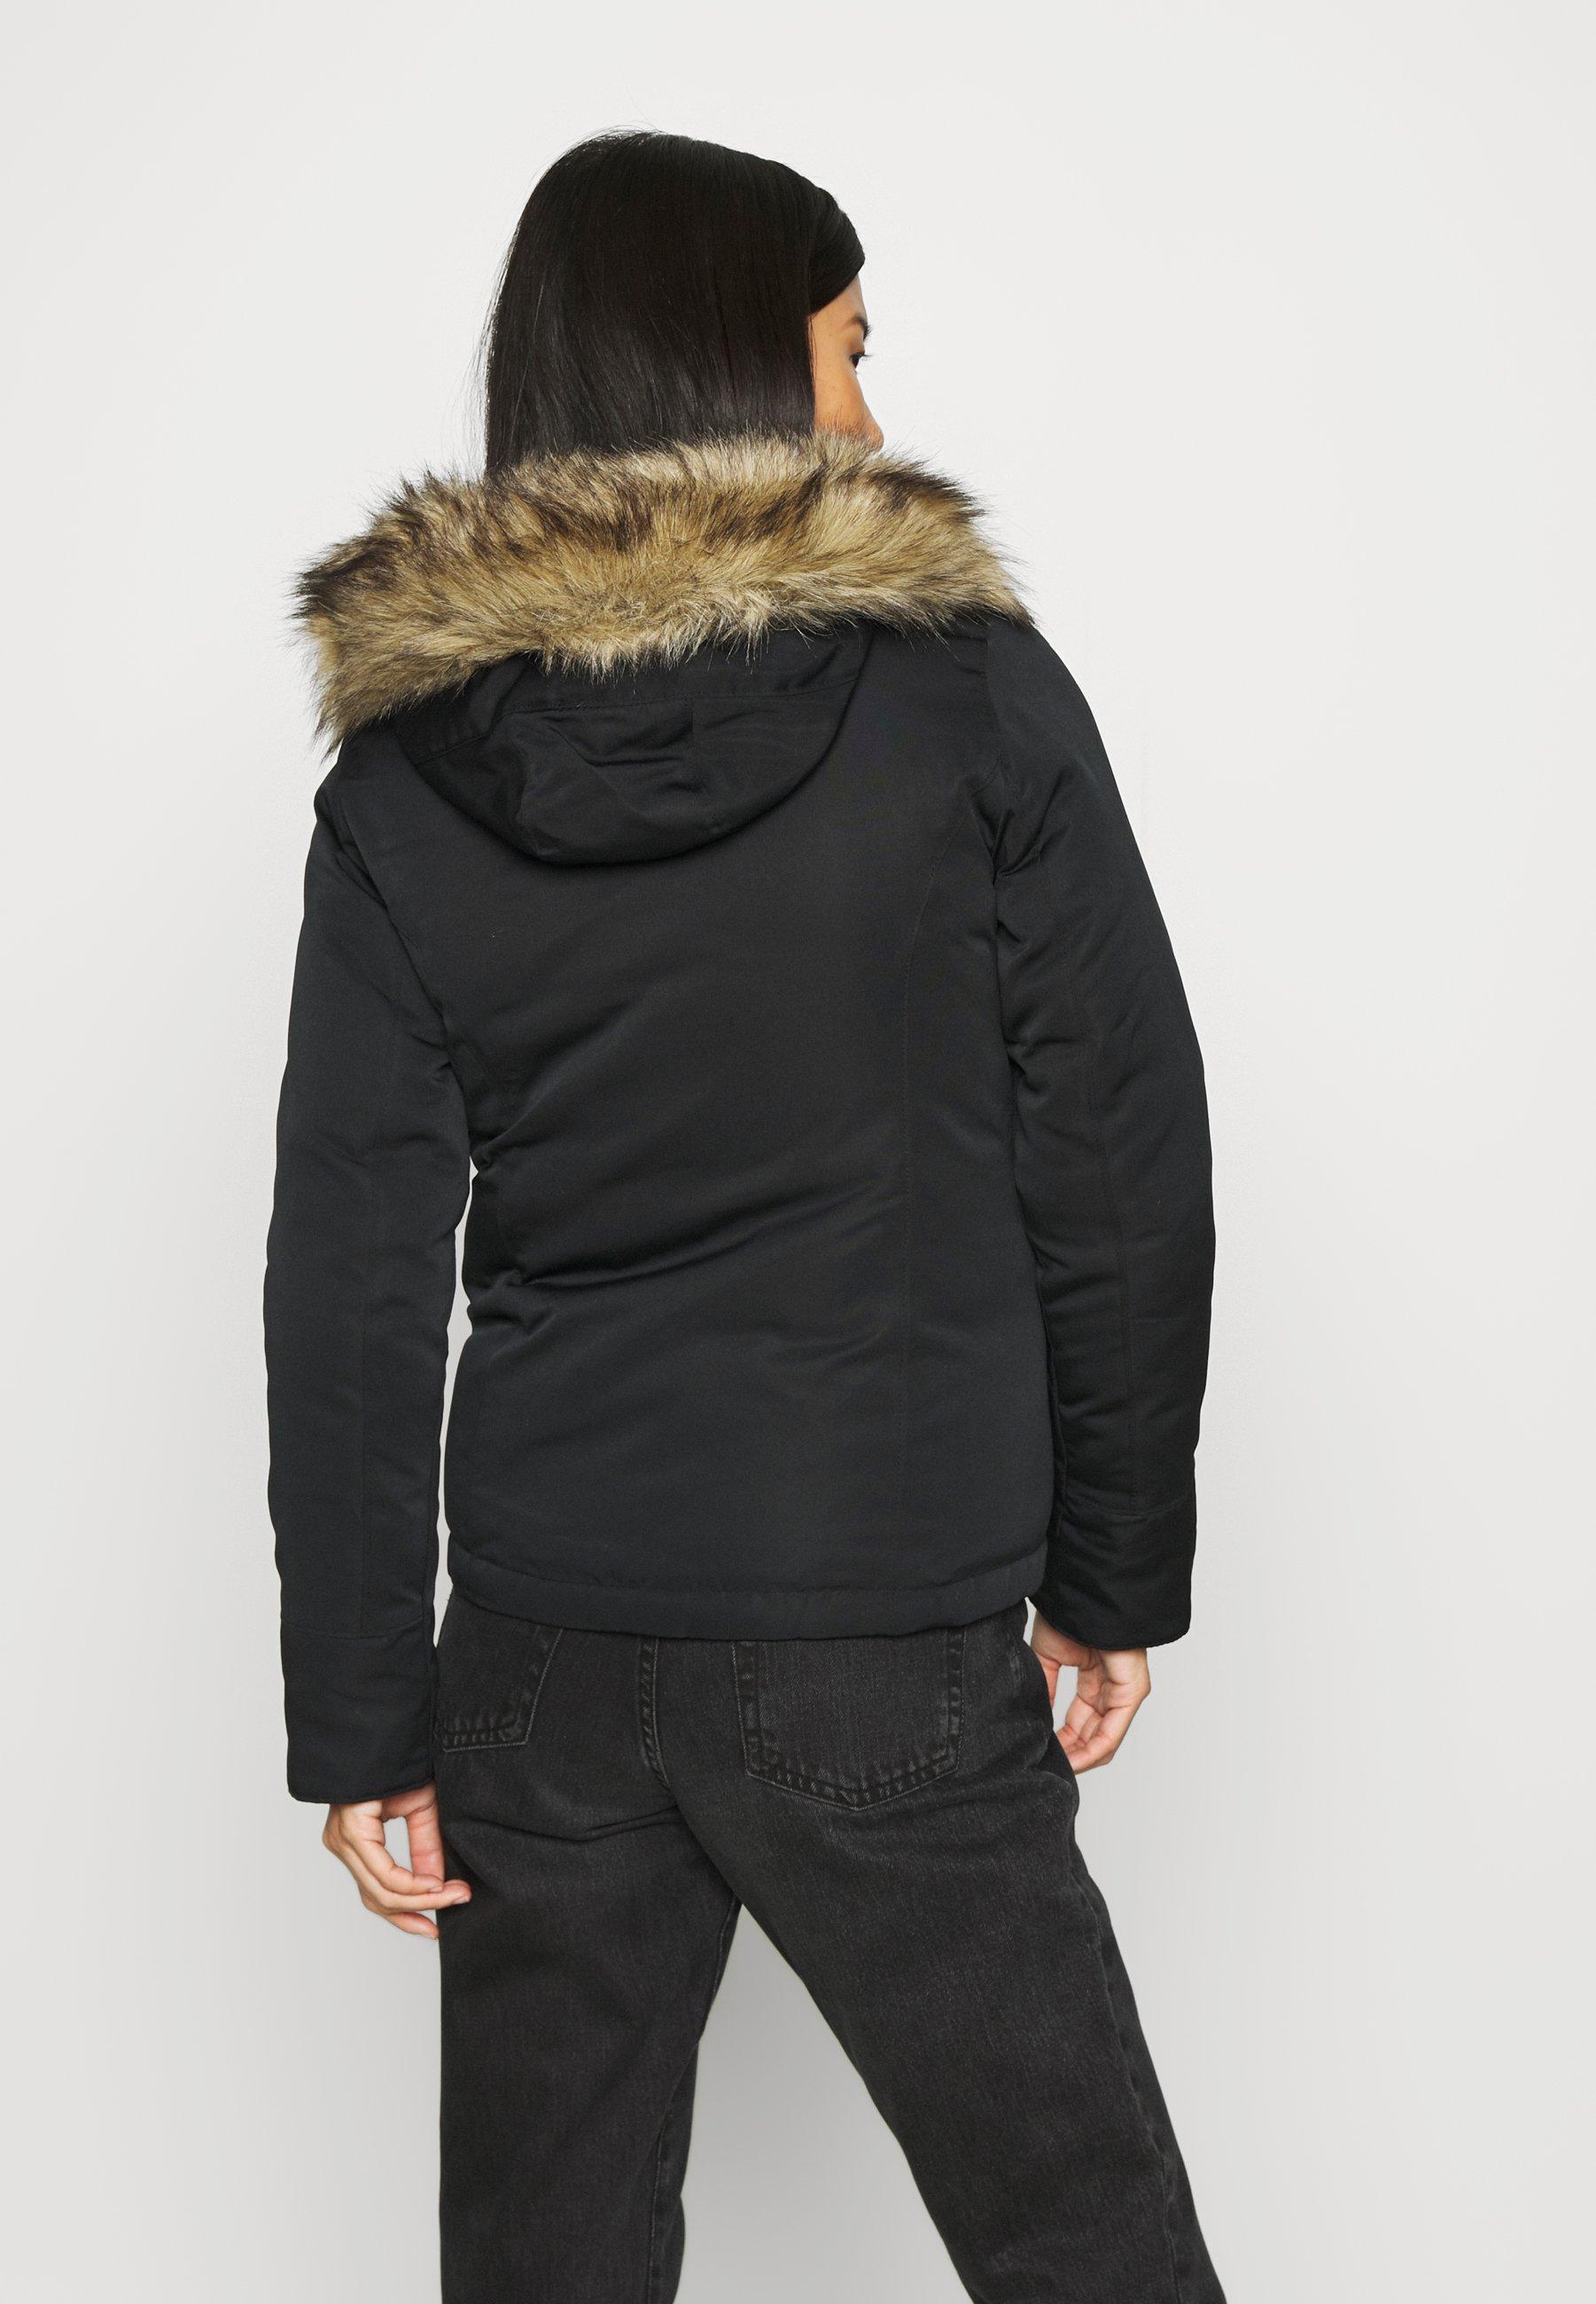 Abercrombie & Fitch MIDWEIGHT TECH  Winterjacke black/schwarz